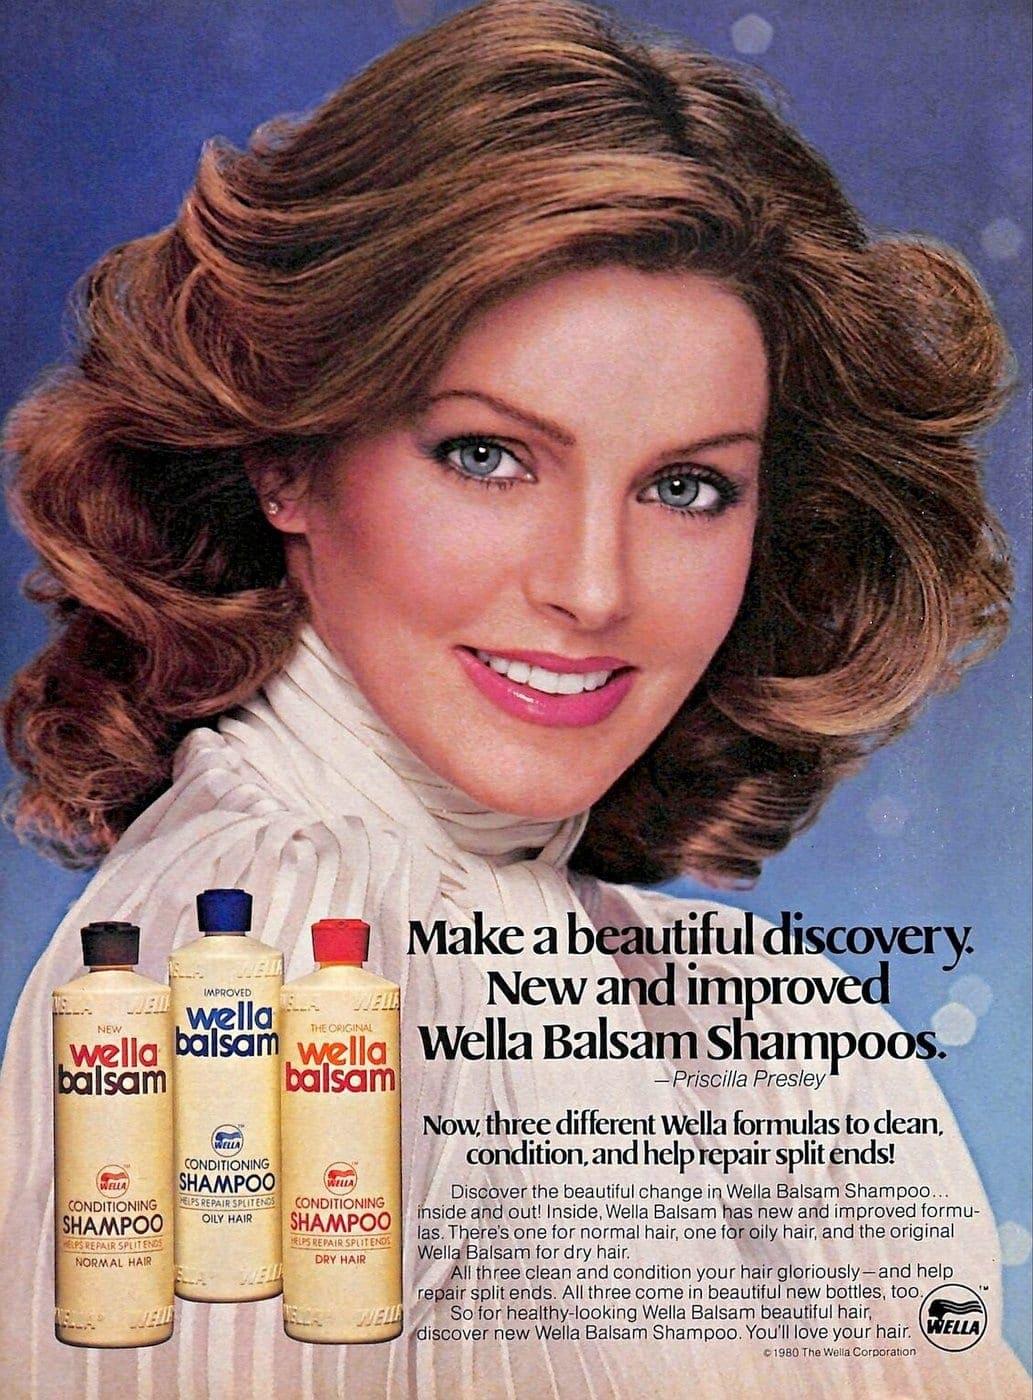 Priscilla Presley for Wella Balsam Shampoos (1980)